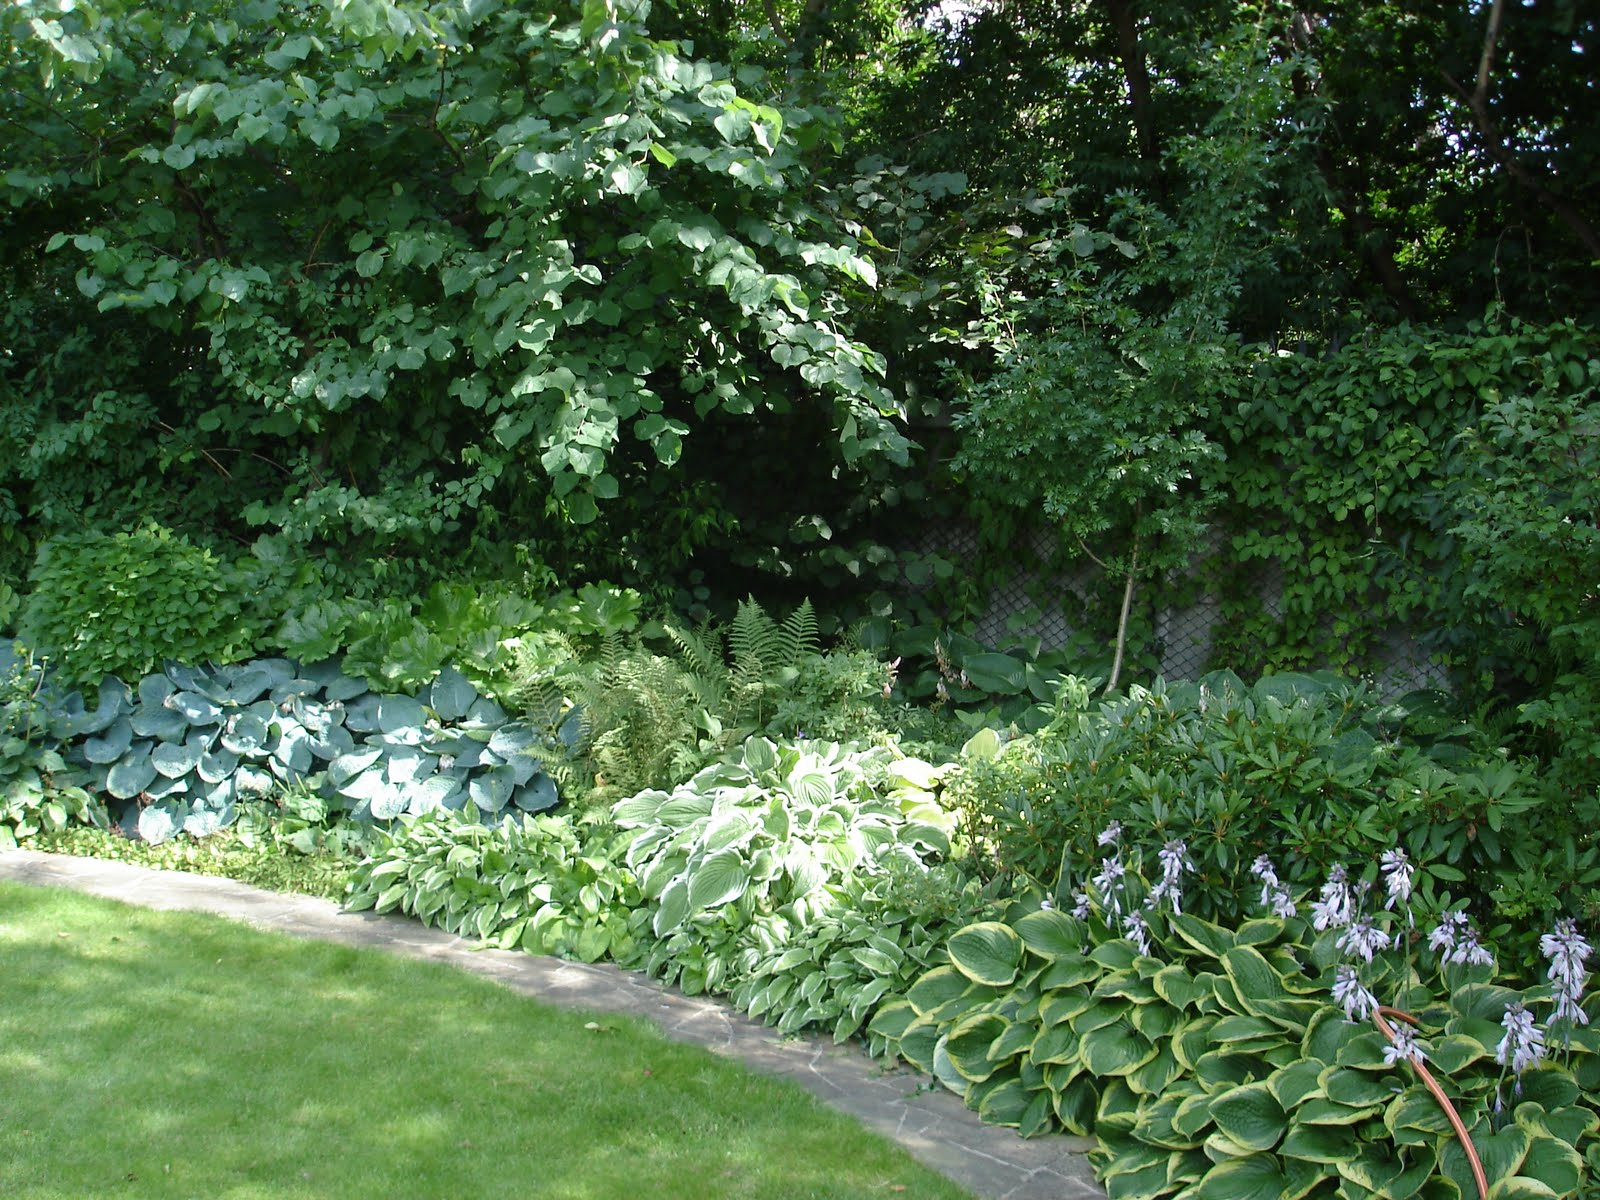 Буддлея Давида из семян (фото) посадка и уход, Сайт о саде, даче и комнатных растениях